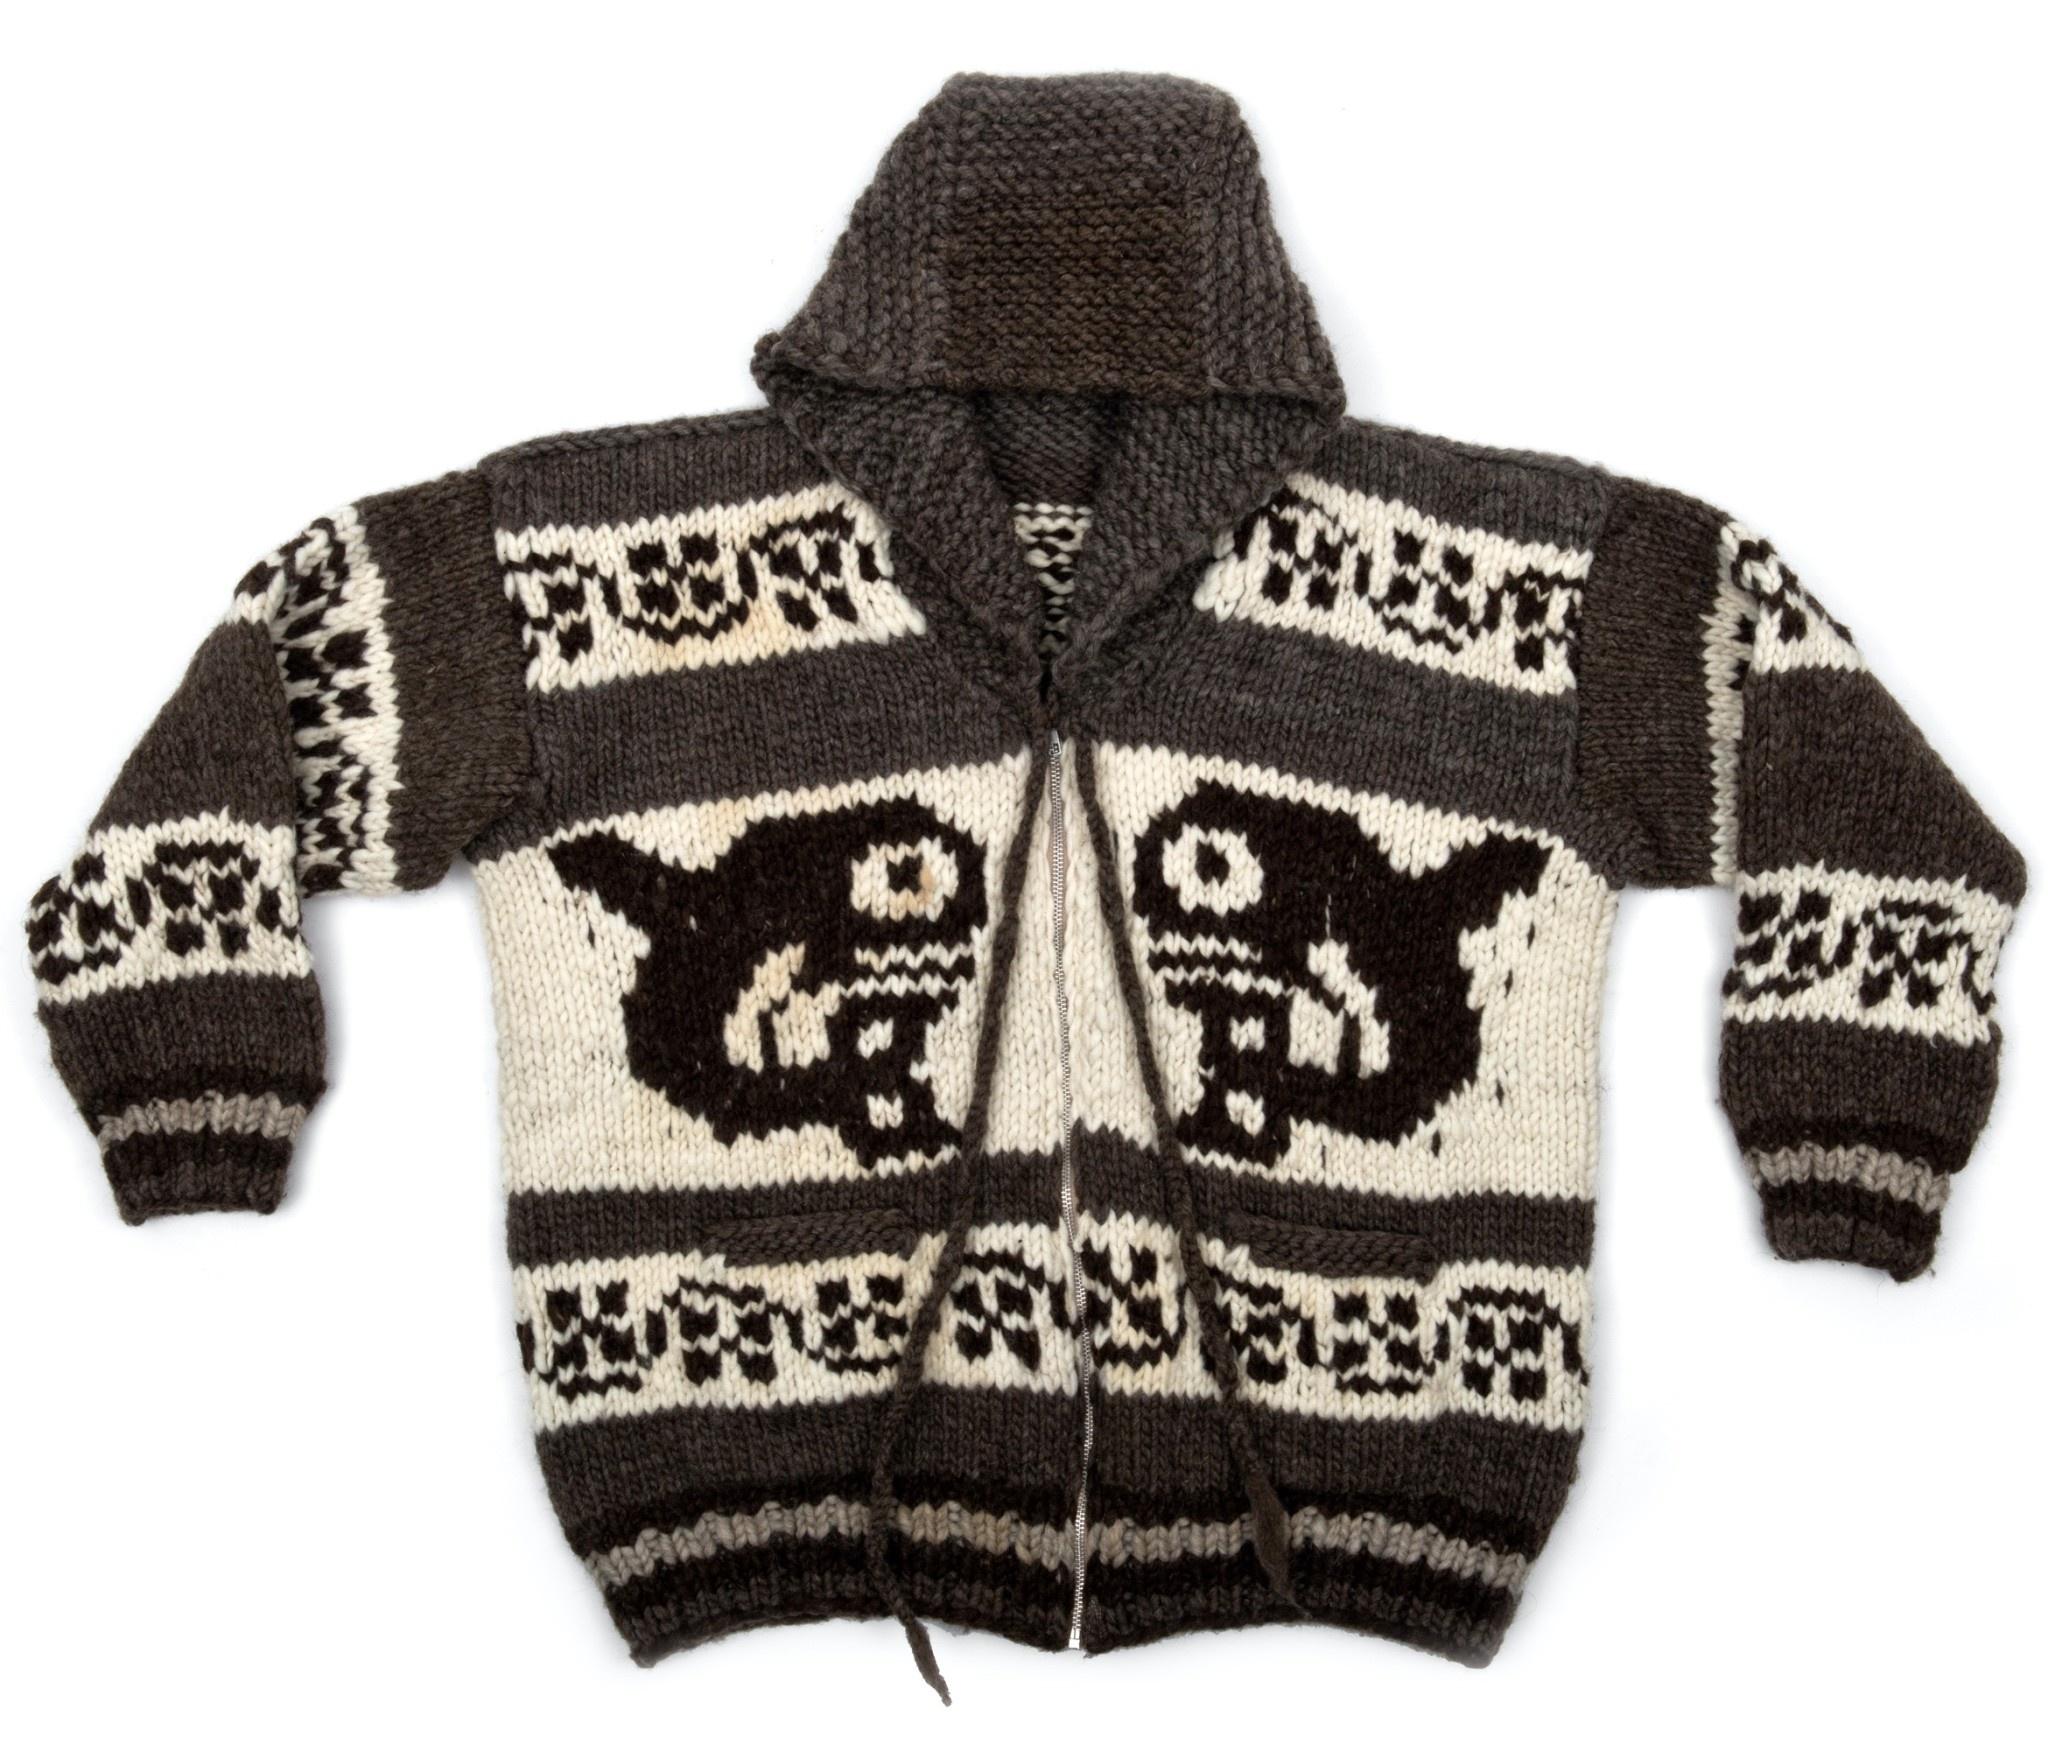 Orca Cowichan Sweater with Hood